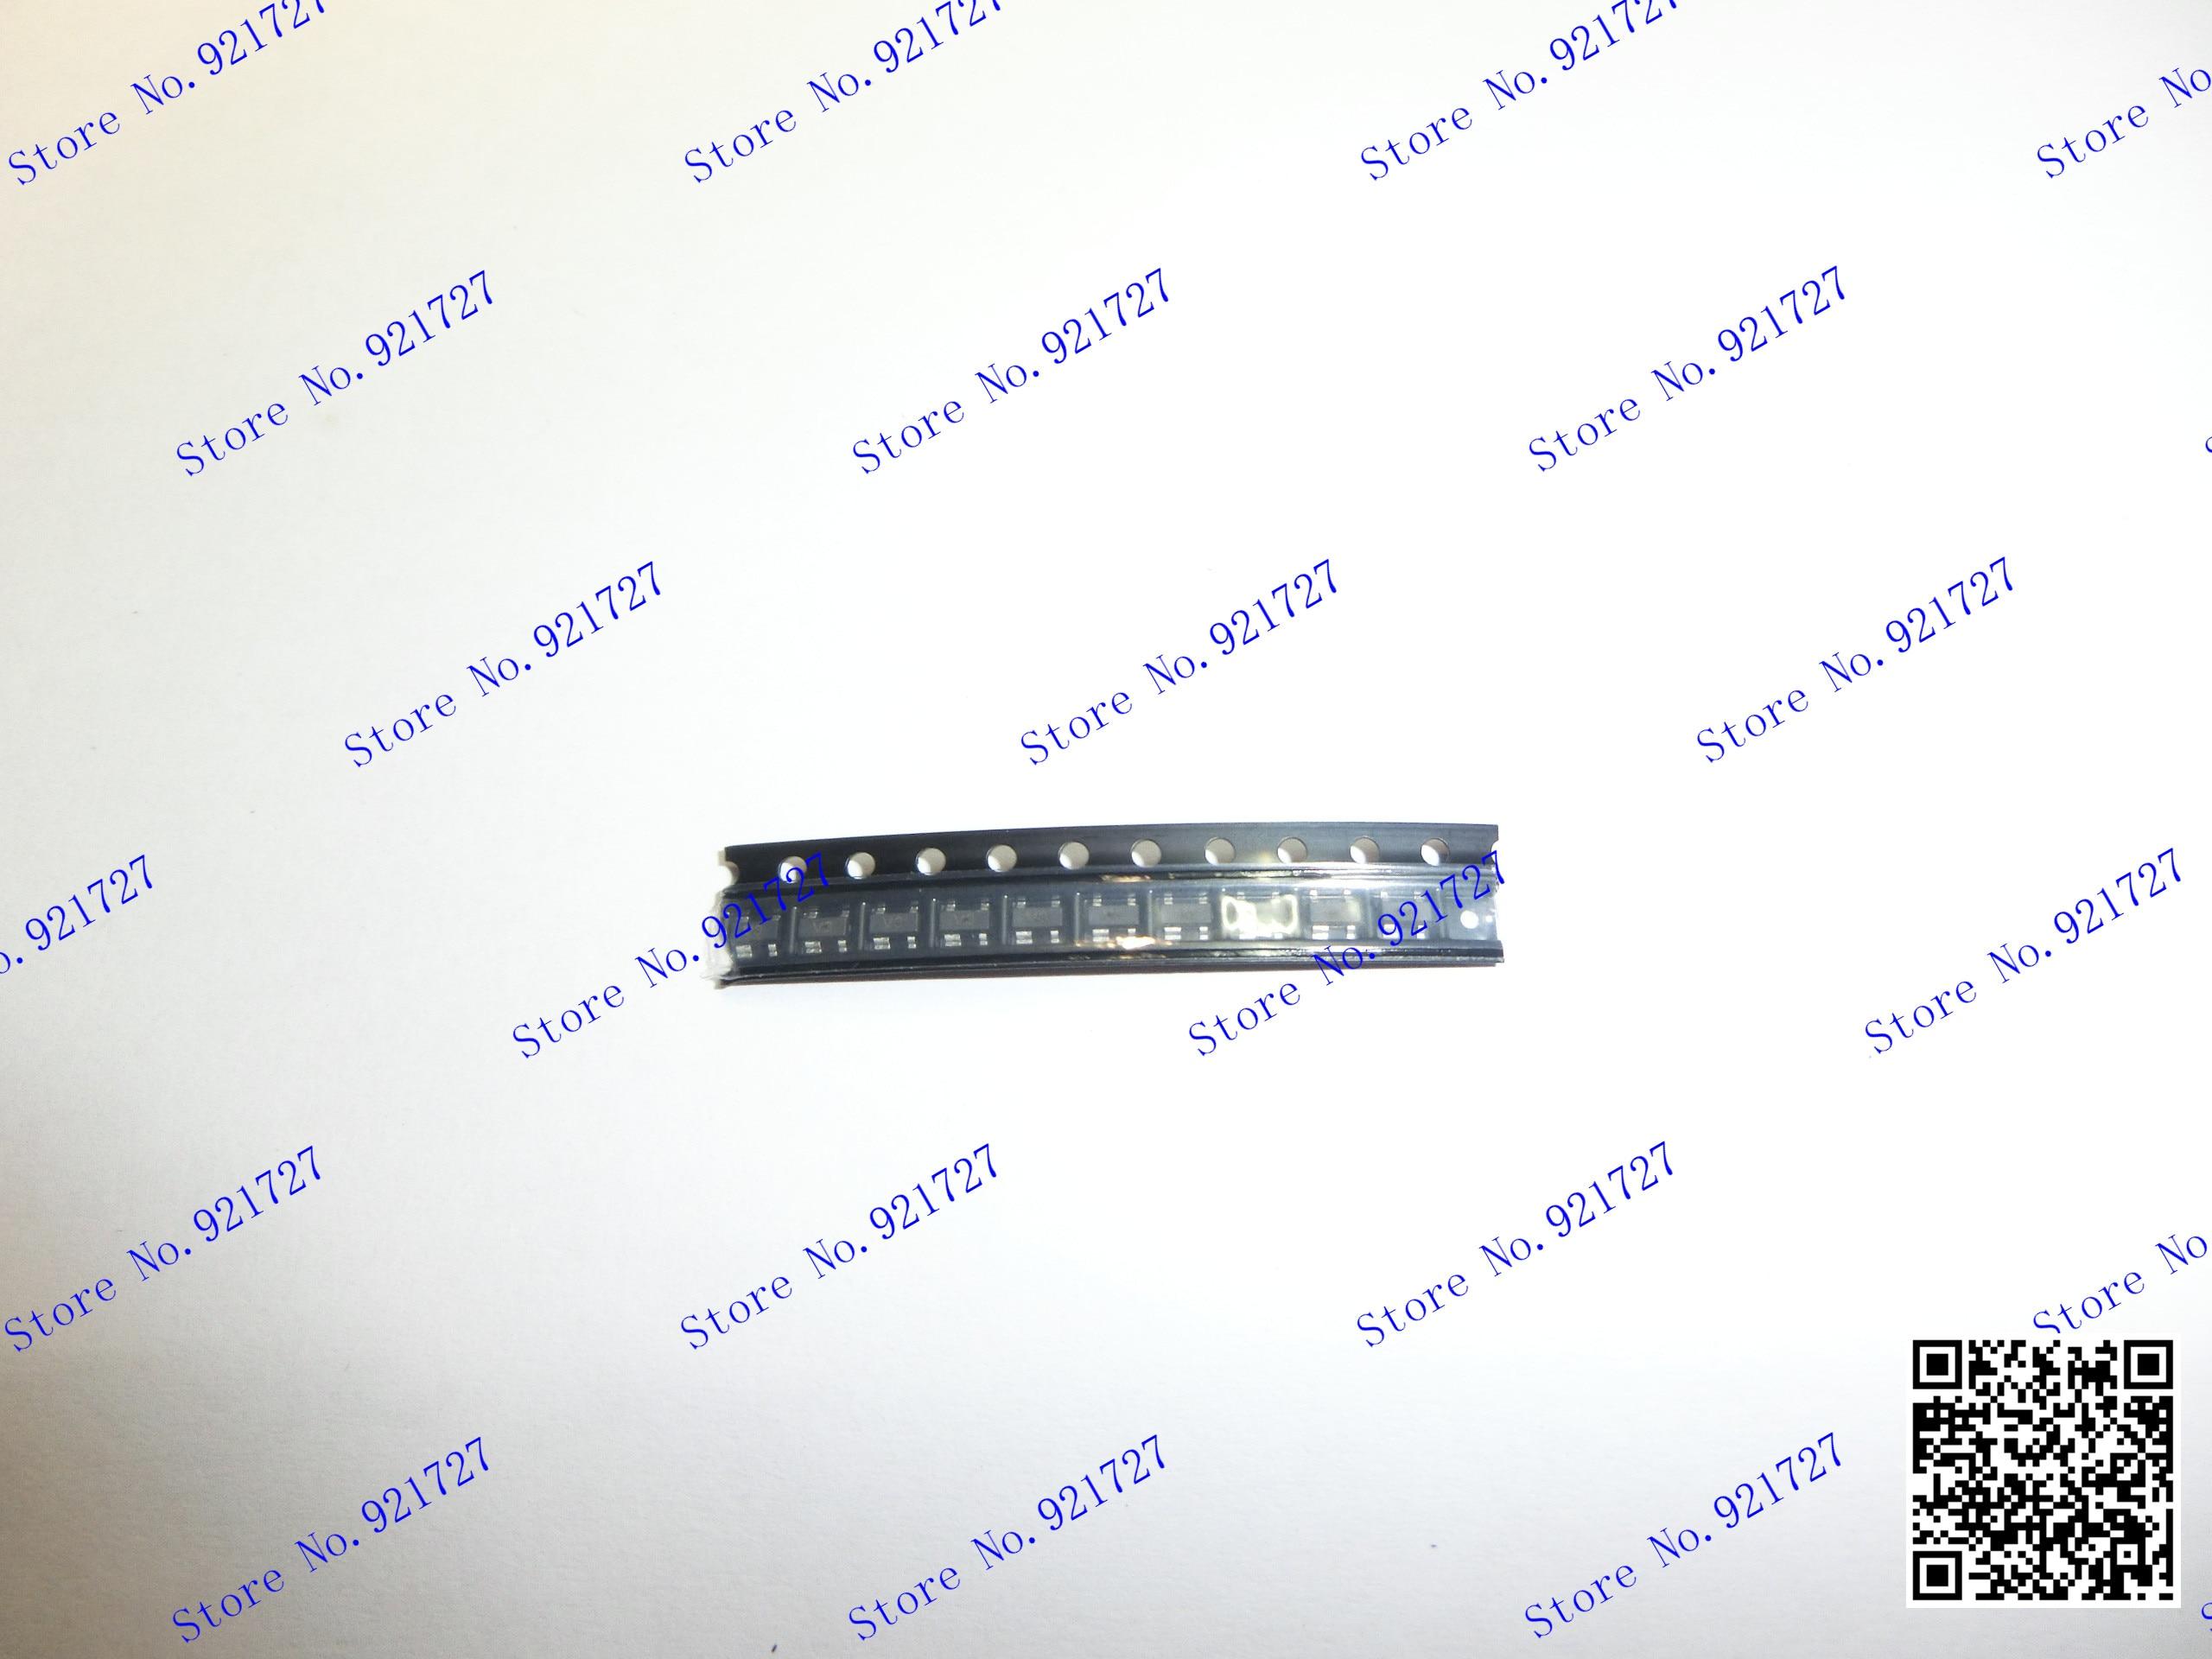 20pcs Bfr93a Sot23 Bfr93 Rf Bipolar Small Signal Transistor New F67 Wiring Diagram Bf67 67 Sot143 30pcs